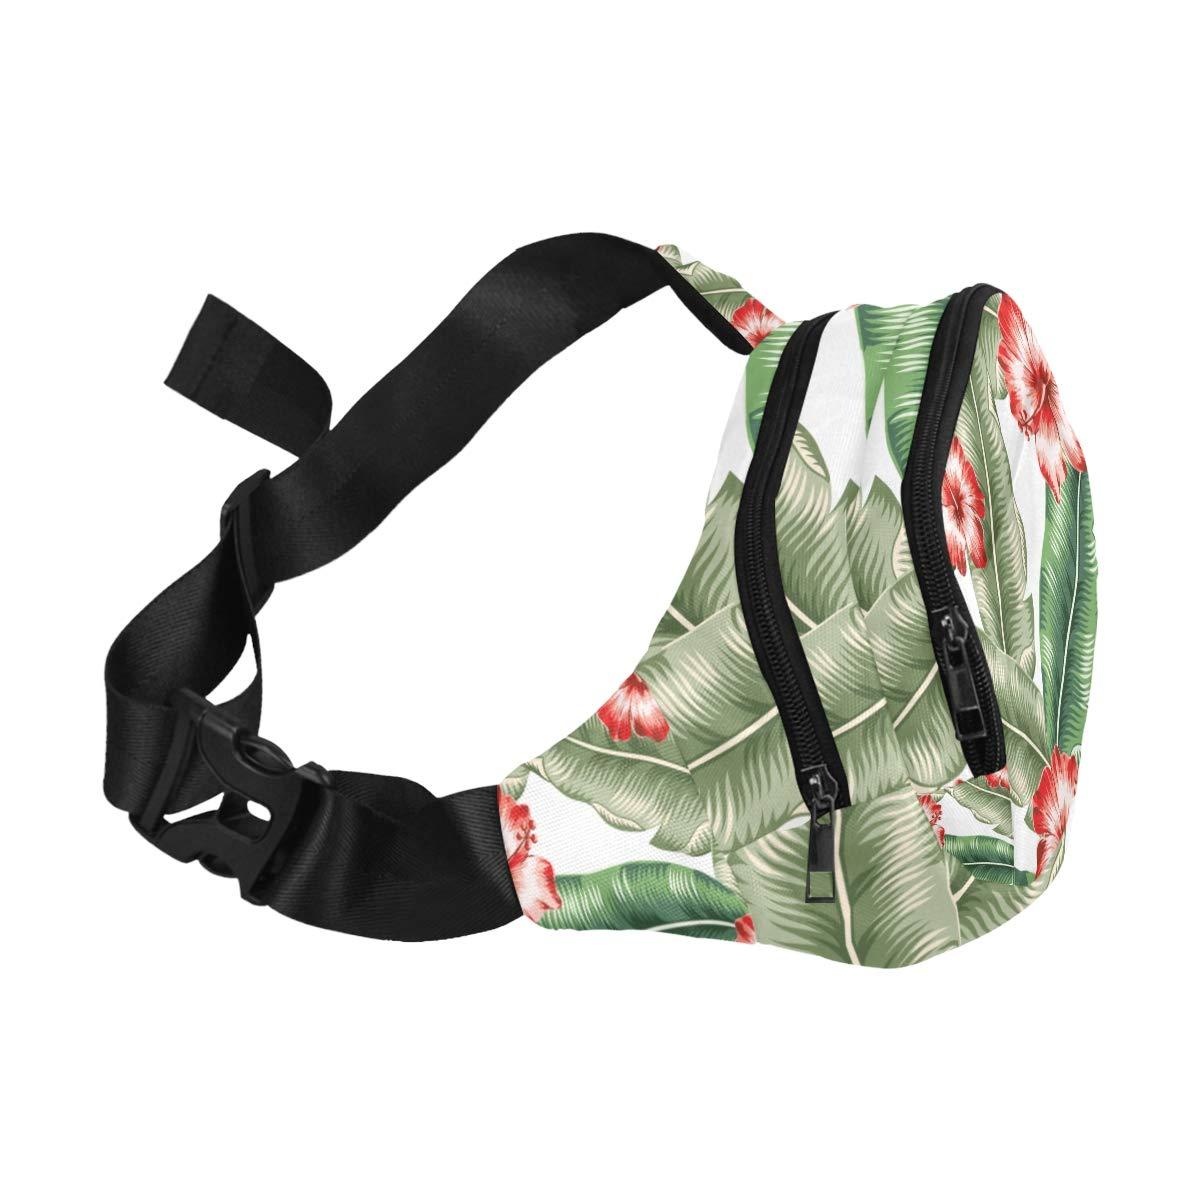 Banana Leaves And Golden Palm Leaves Fenny Packs Waist Bags Adjustable Belt Waterproof Nylon Travel Running Sport Vacation Party For Men Women Boys Girls Kids